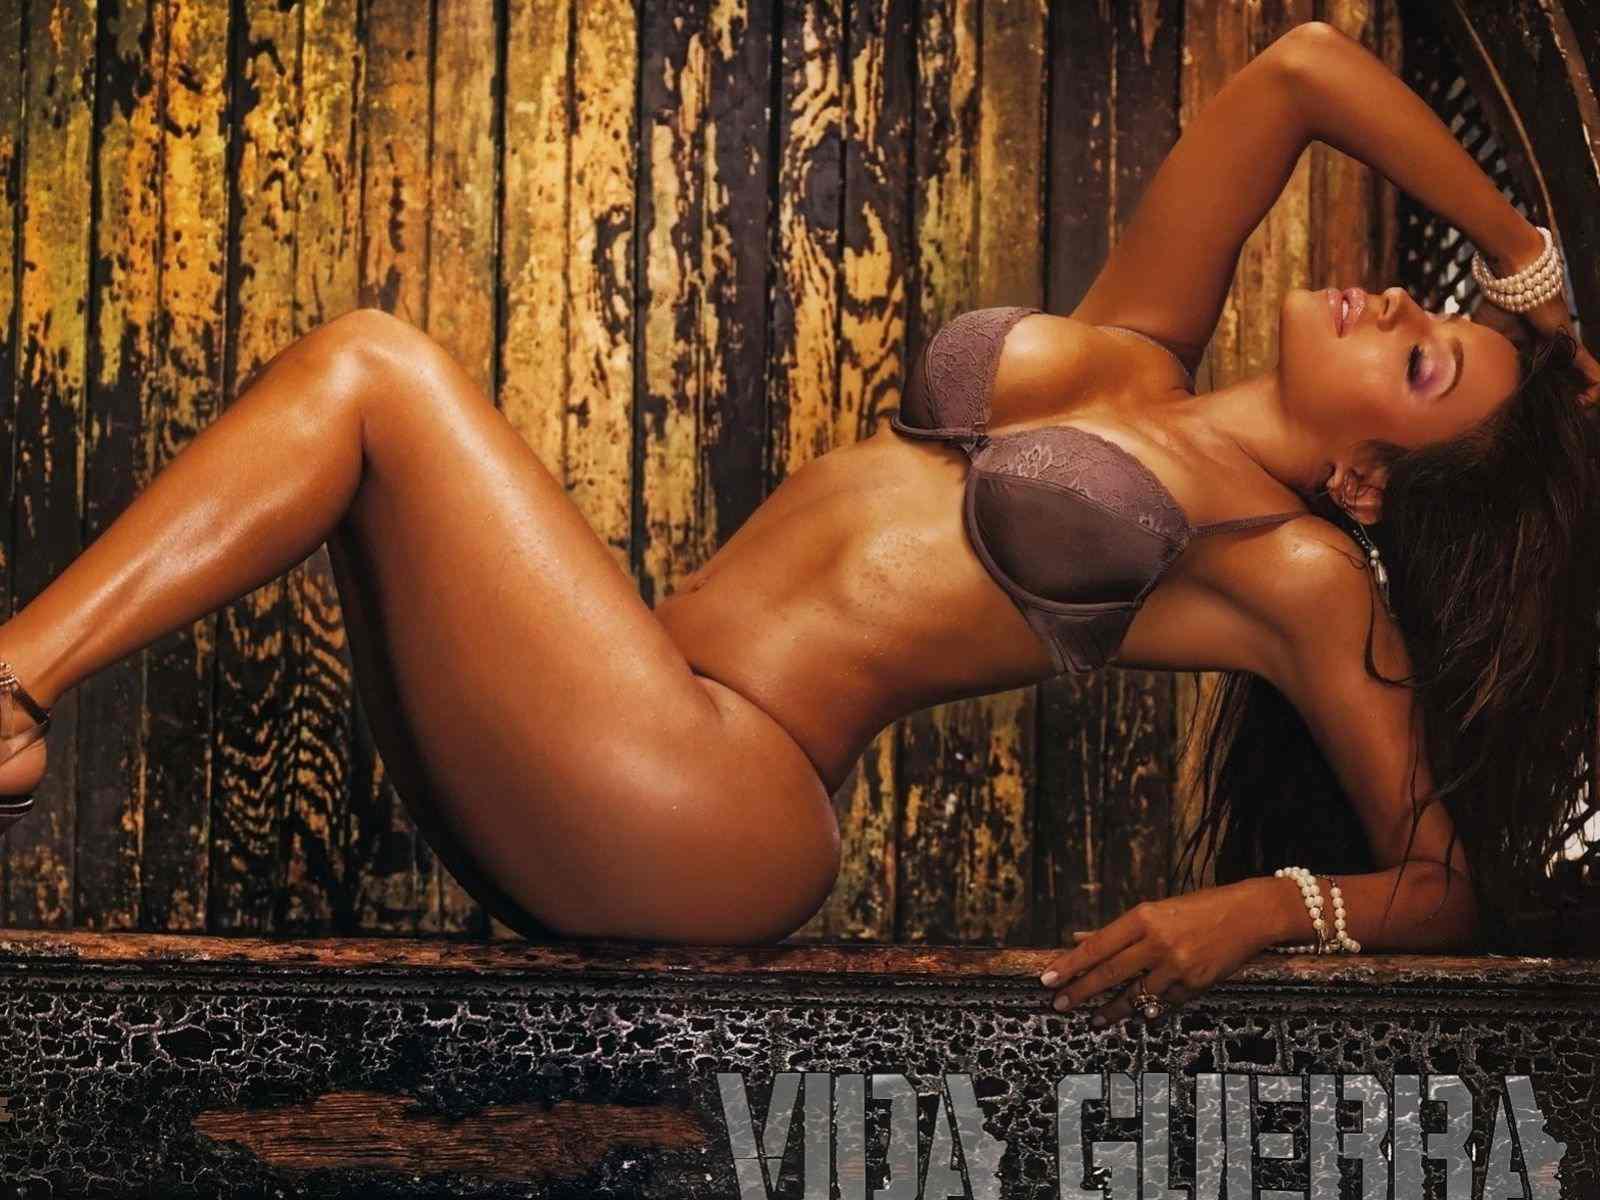 hollywood nude actress boobs fuck xxx hd photos olivia wilde nude